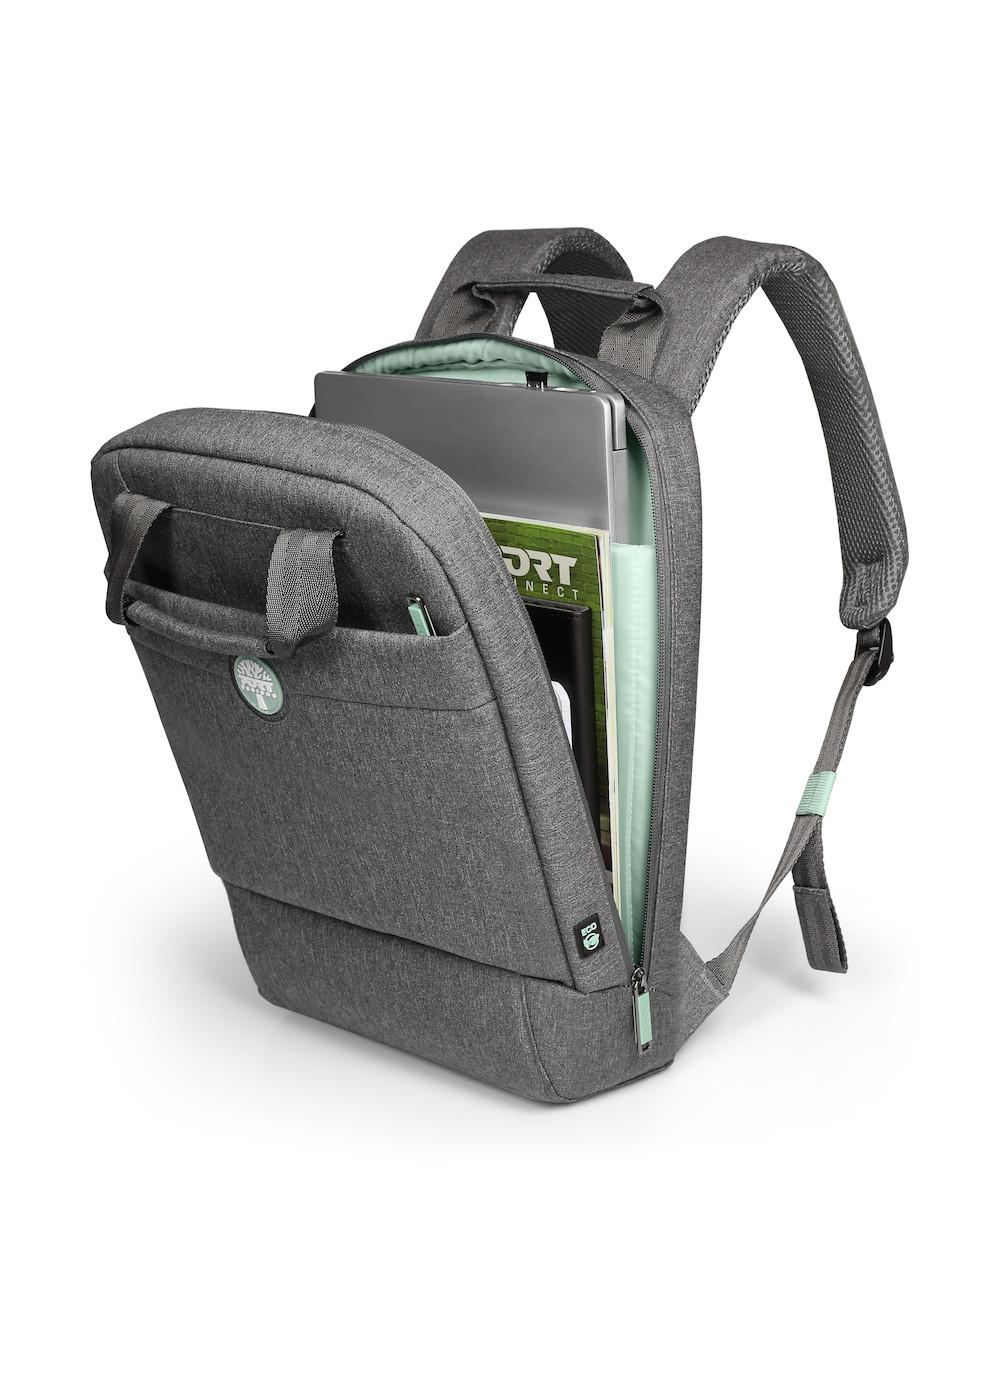 PORT Designs YOSEMITE Eco - Rucksack - 35,6 cm (14 Zoll) - Schultergurt - 530 g